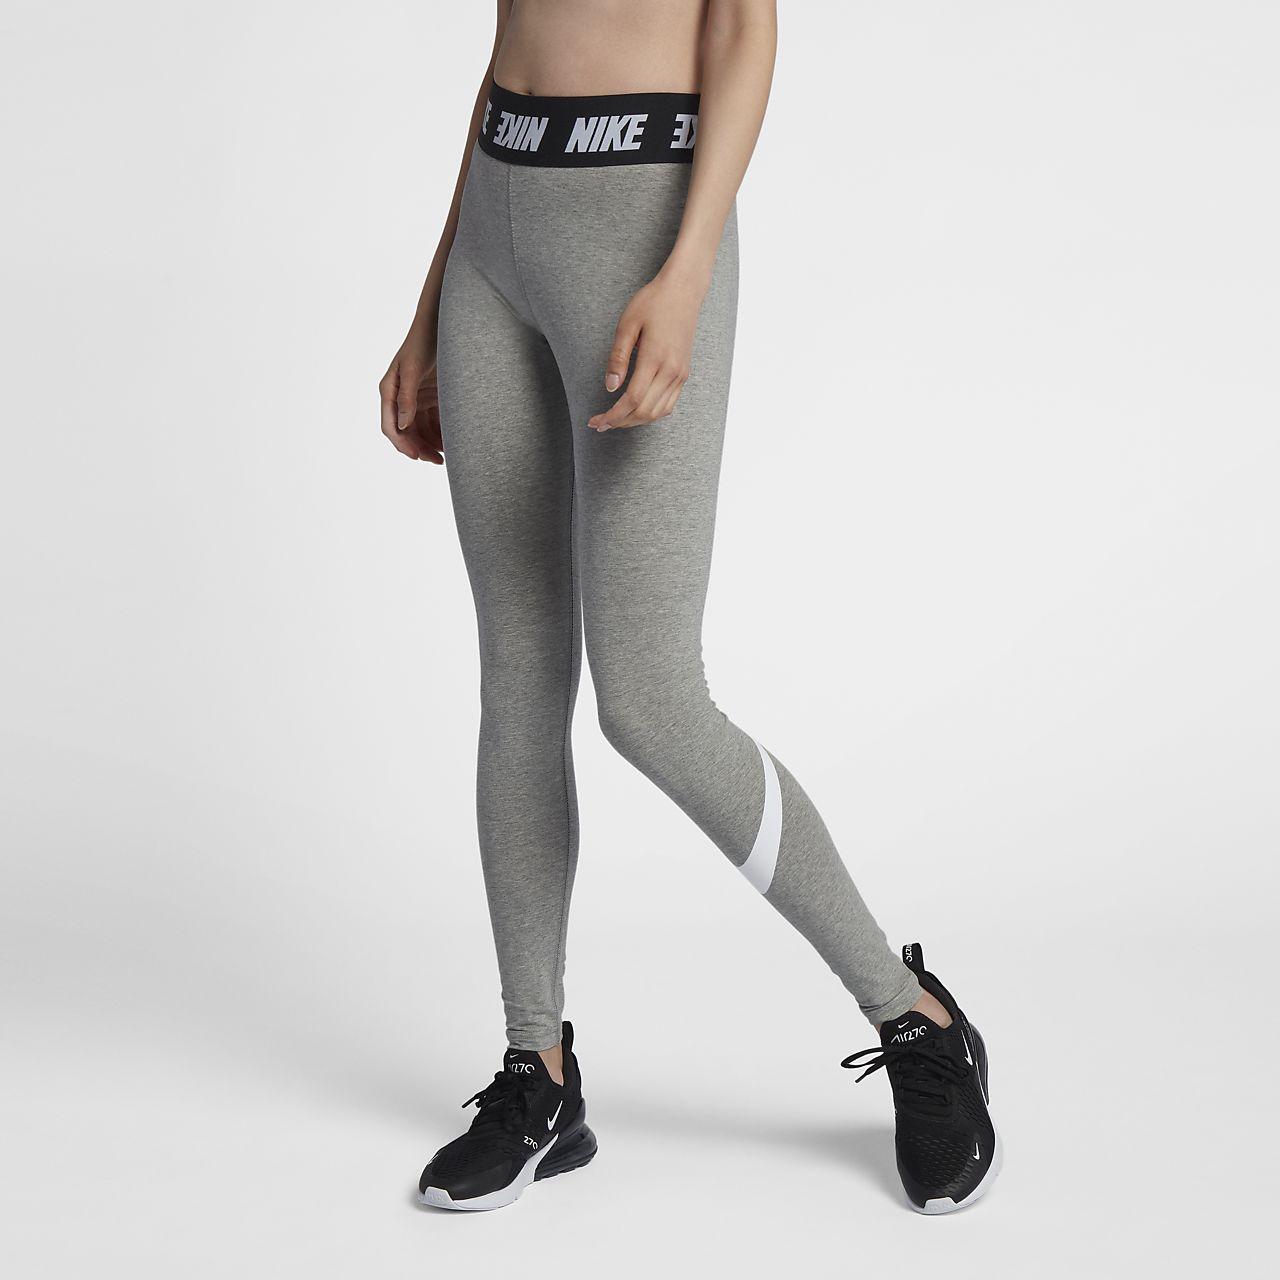 Nike Sportswear Club Damen-Leggings mit hohem Bündchen